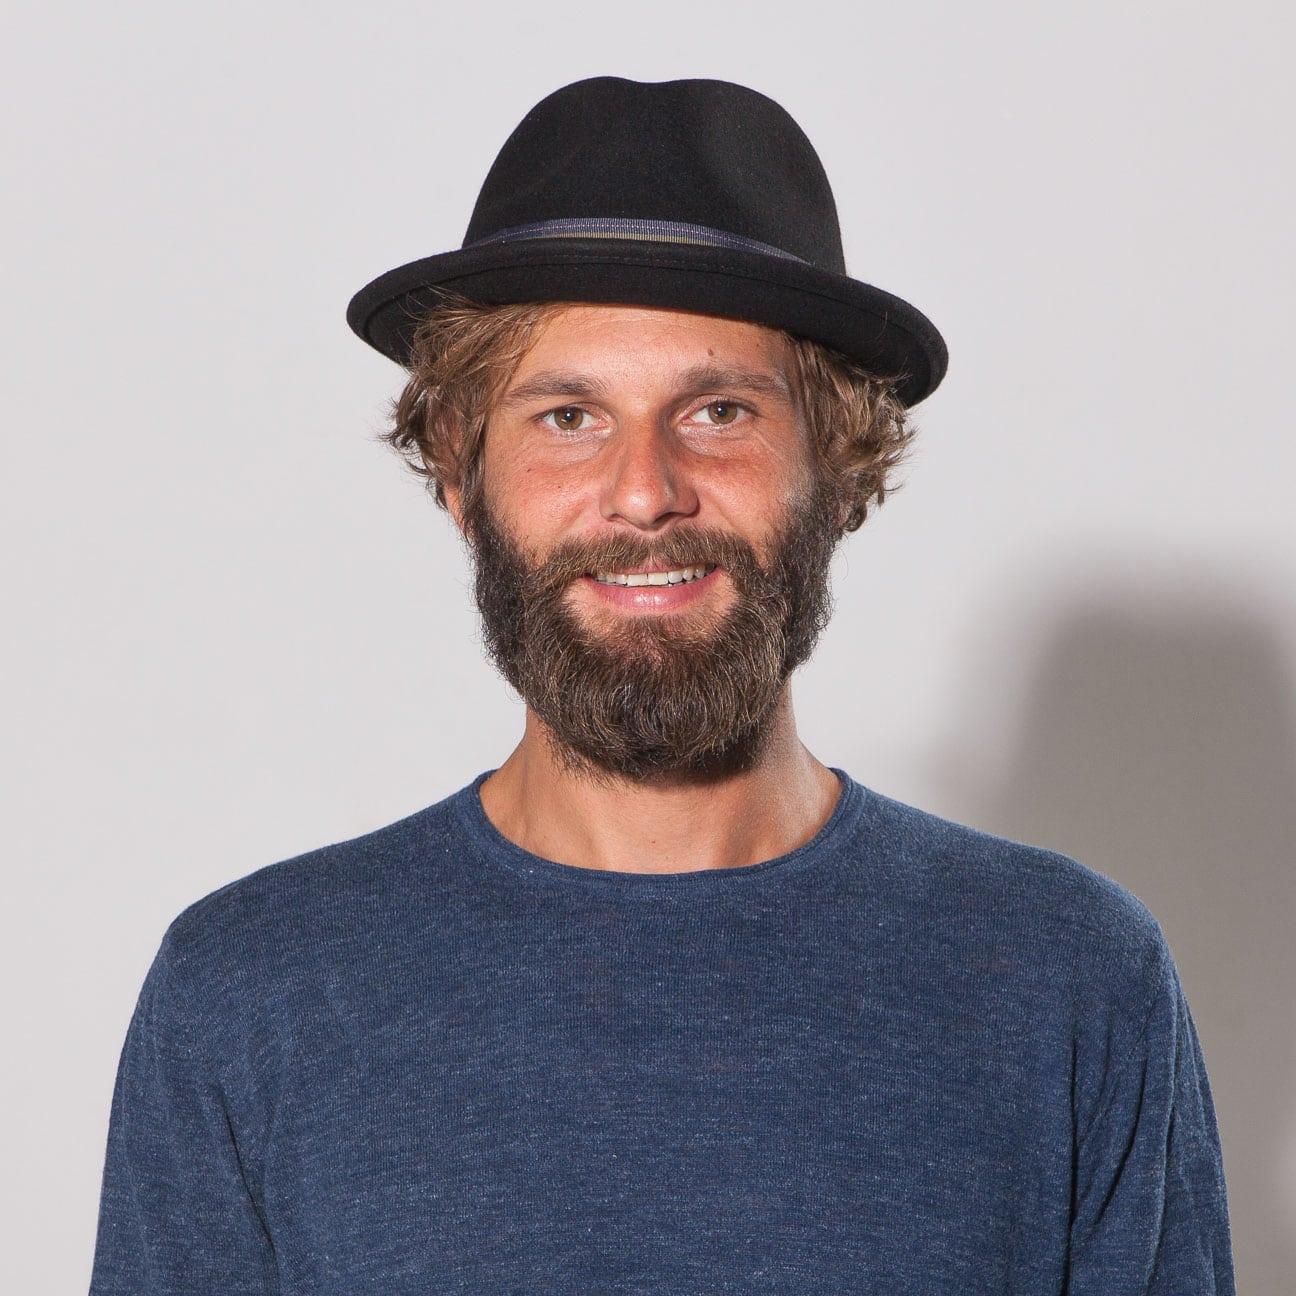 1b3e7fa85 Manhat Wool Felt Fedora Hat by Stetson